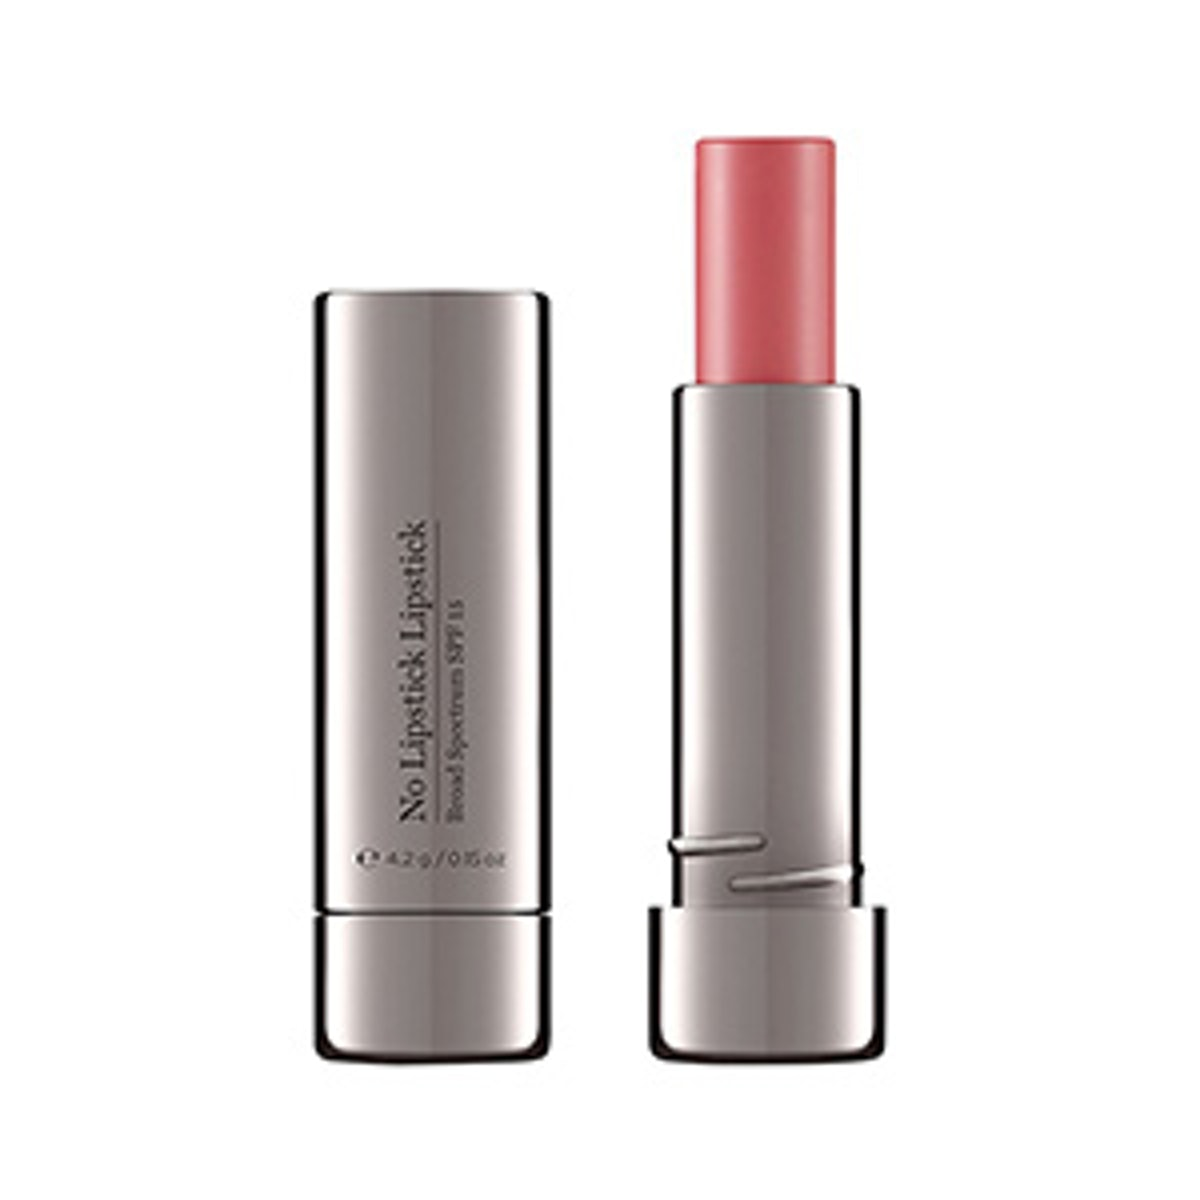 No Lipstick Lipstick SPF 15